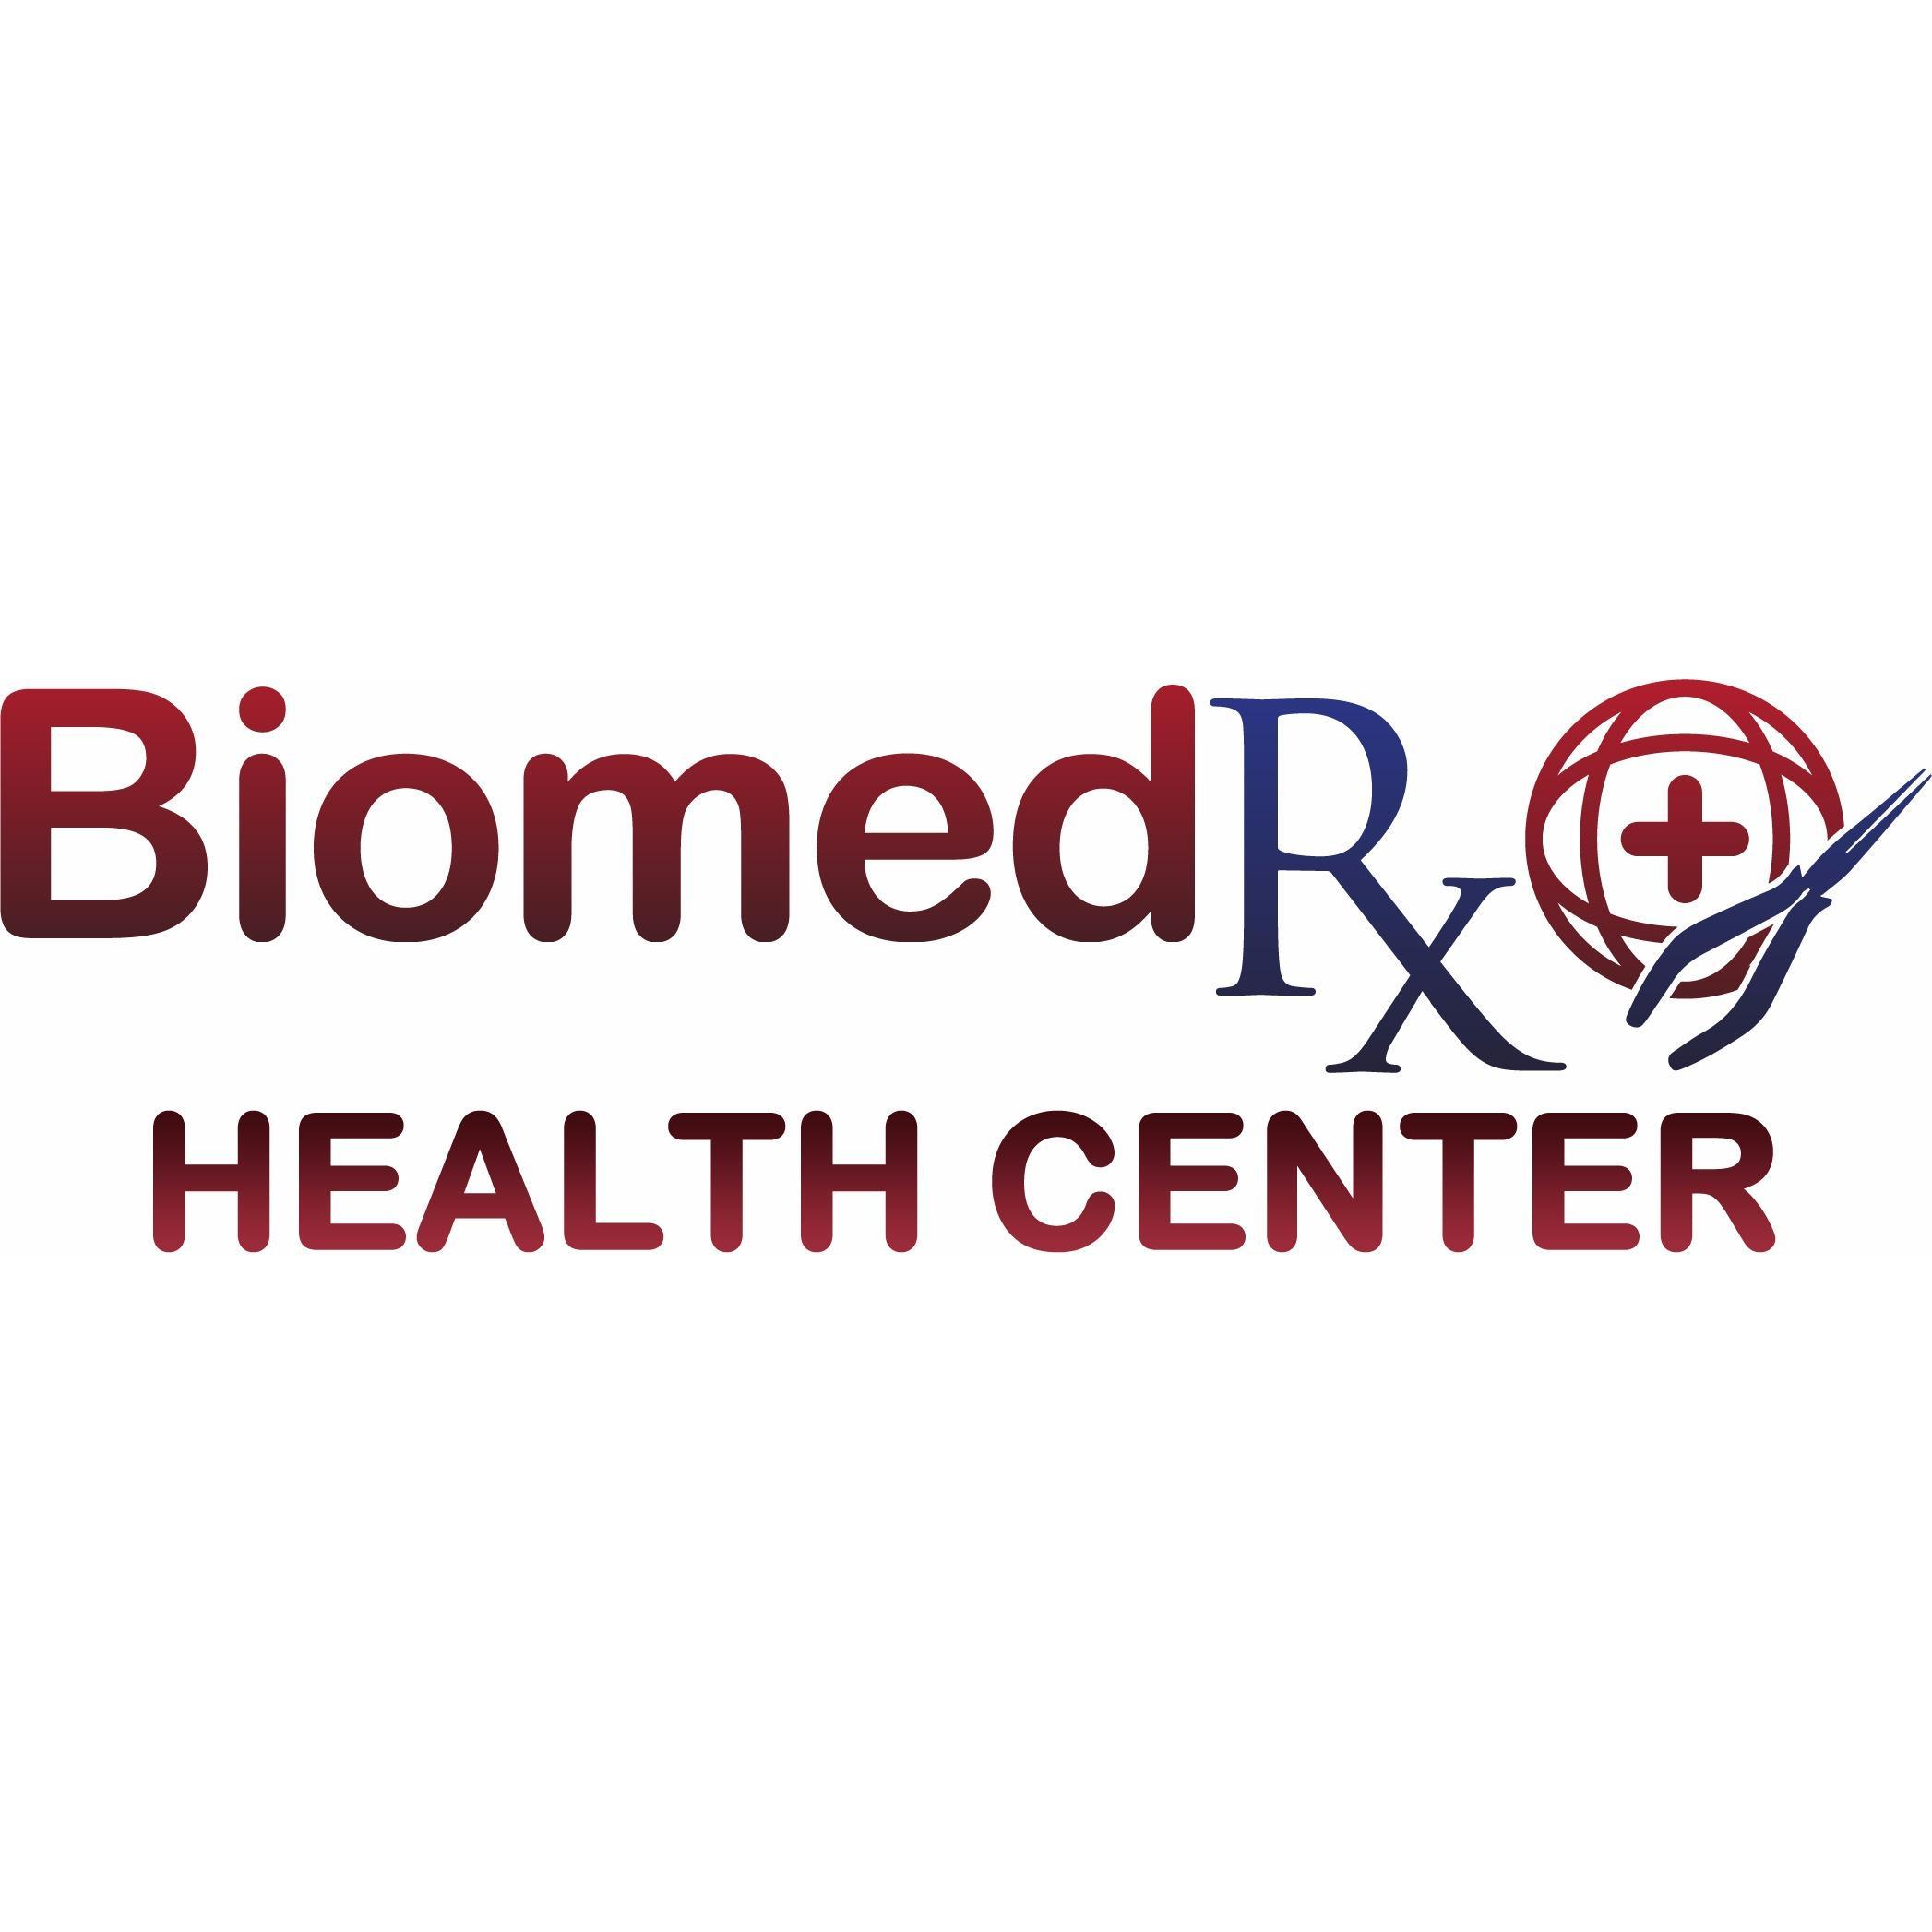 BiomedRx Health Center